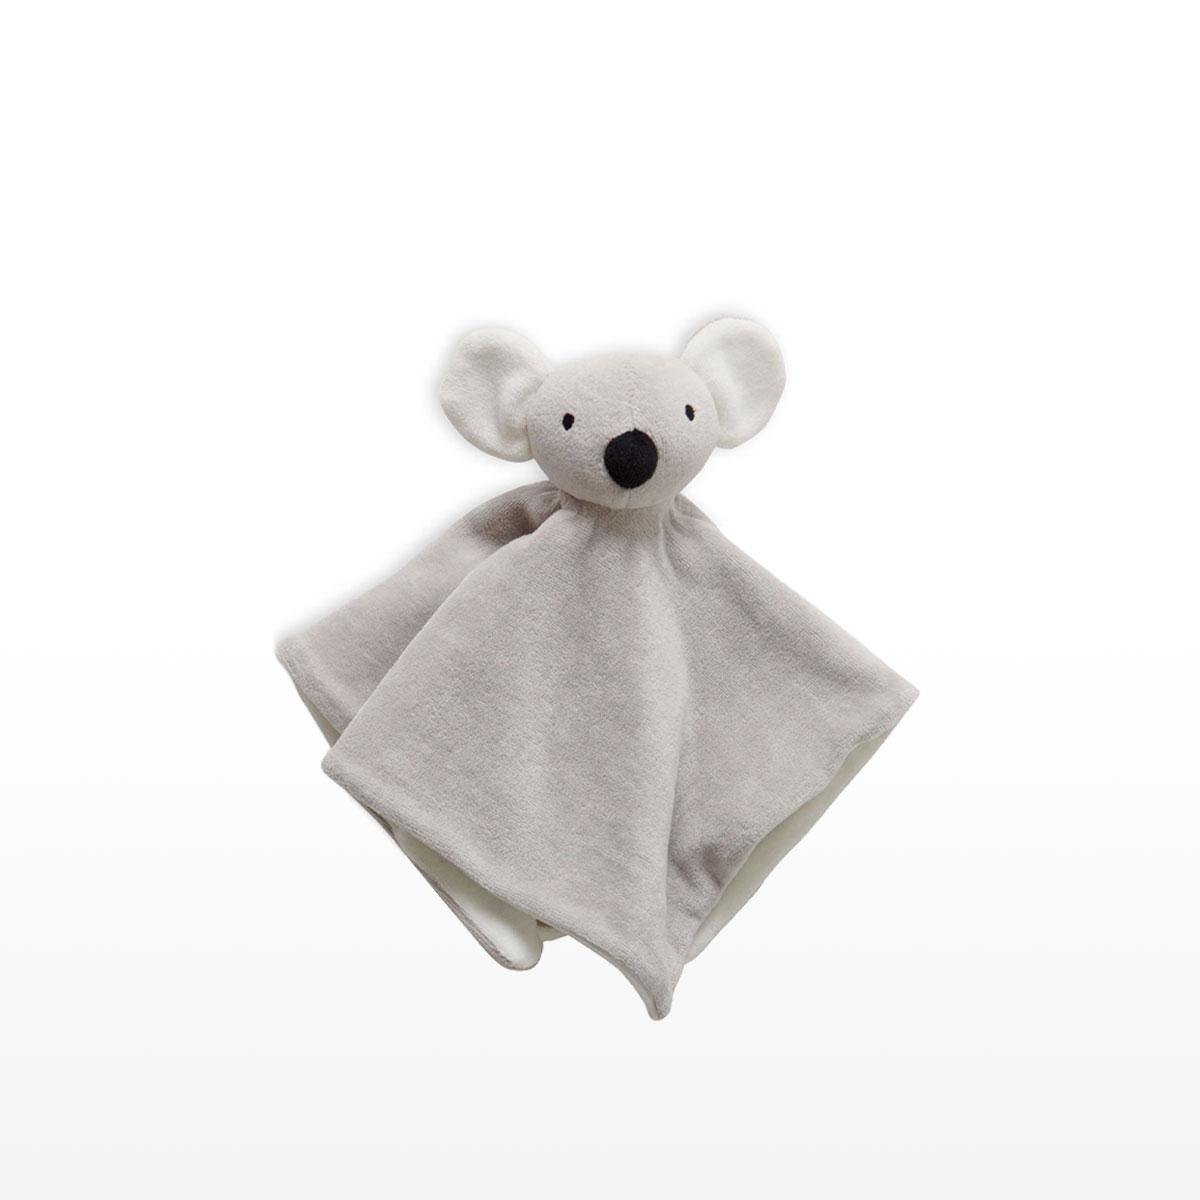 Purebaby Koala Snookie Grey Comforter 35 x 35cm